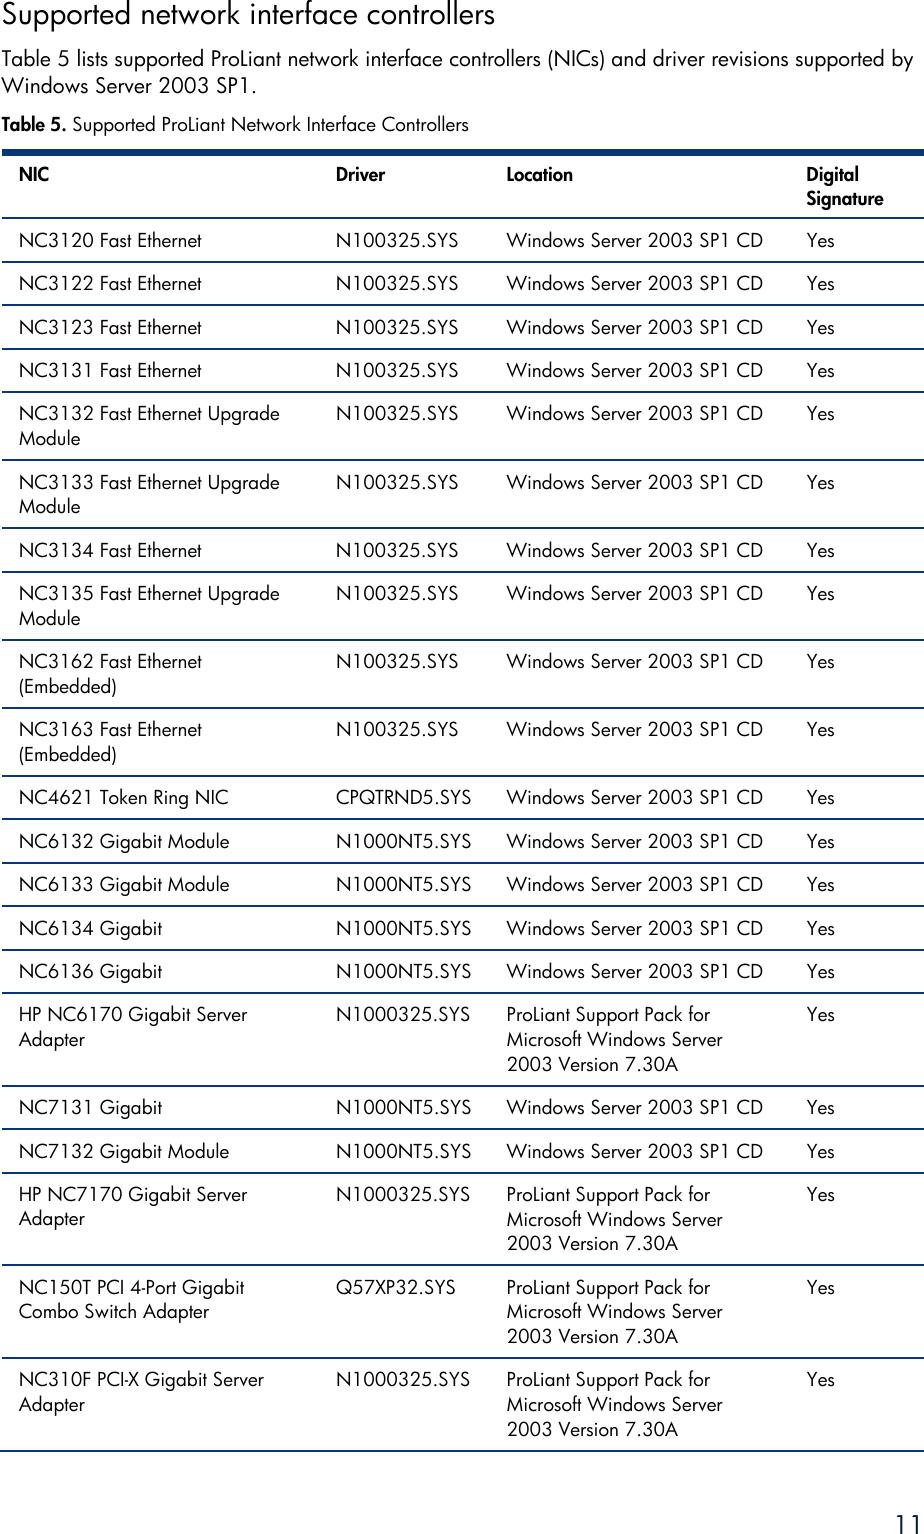 HP NC7782 MINIPORT DRIVERS FOR WINDOWS 8